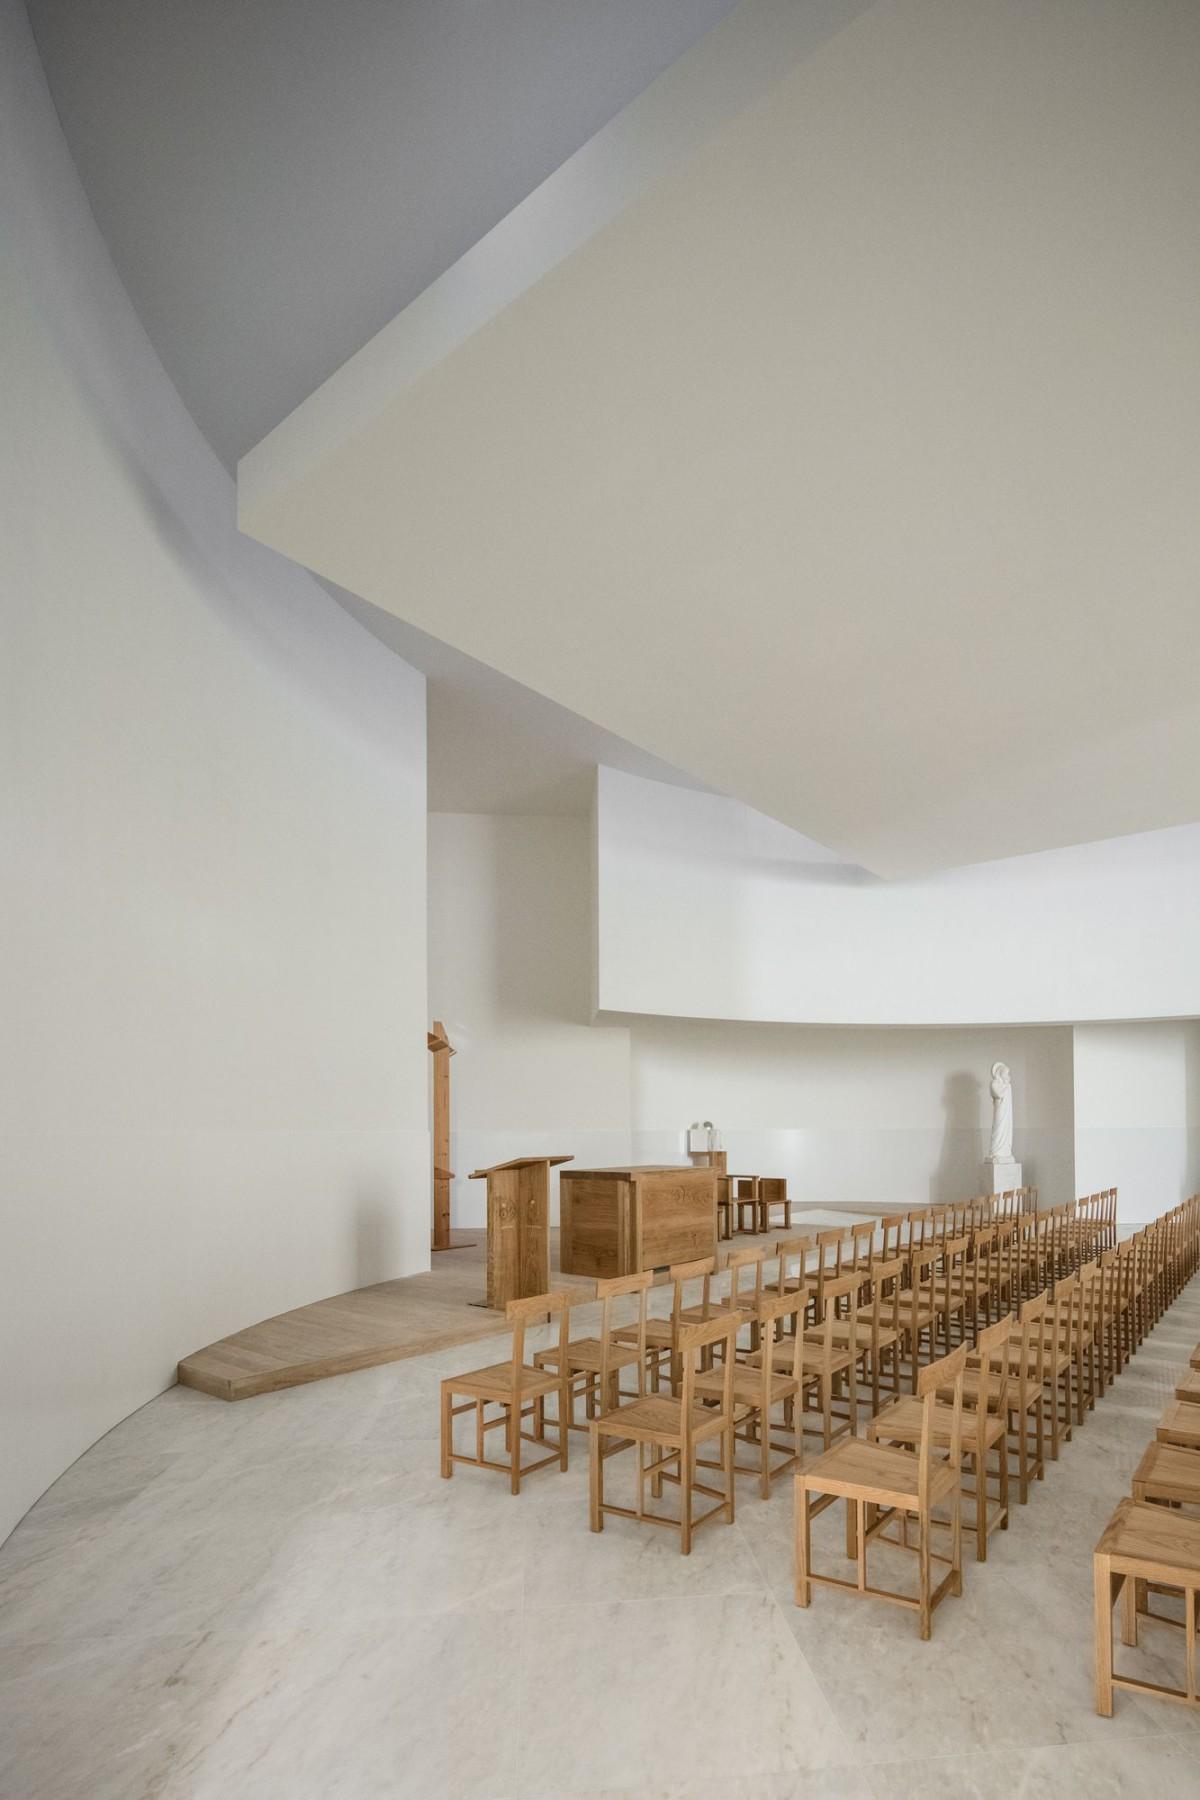 Alvaro Siza . Church of Saint-Jacques de la Lande . Rennes (55)